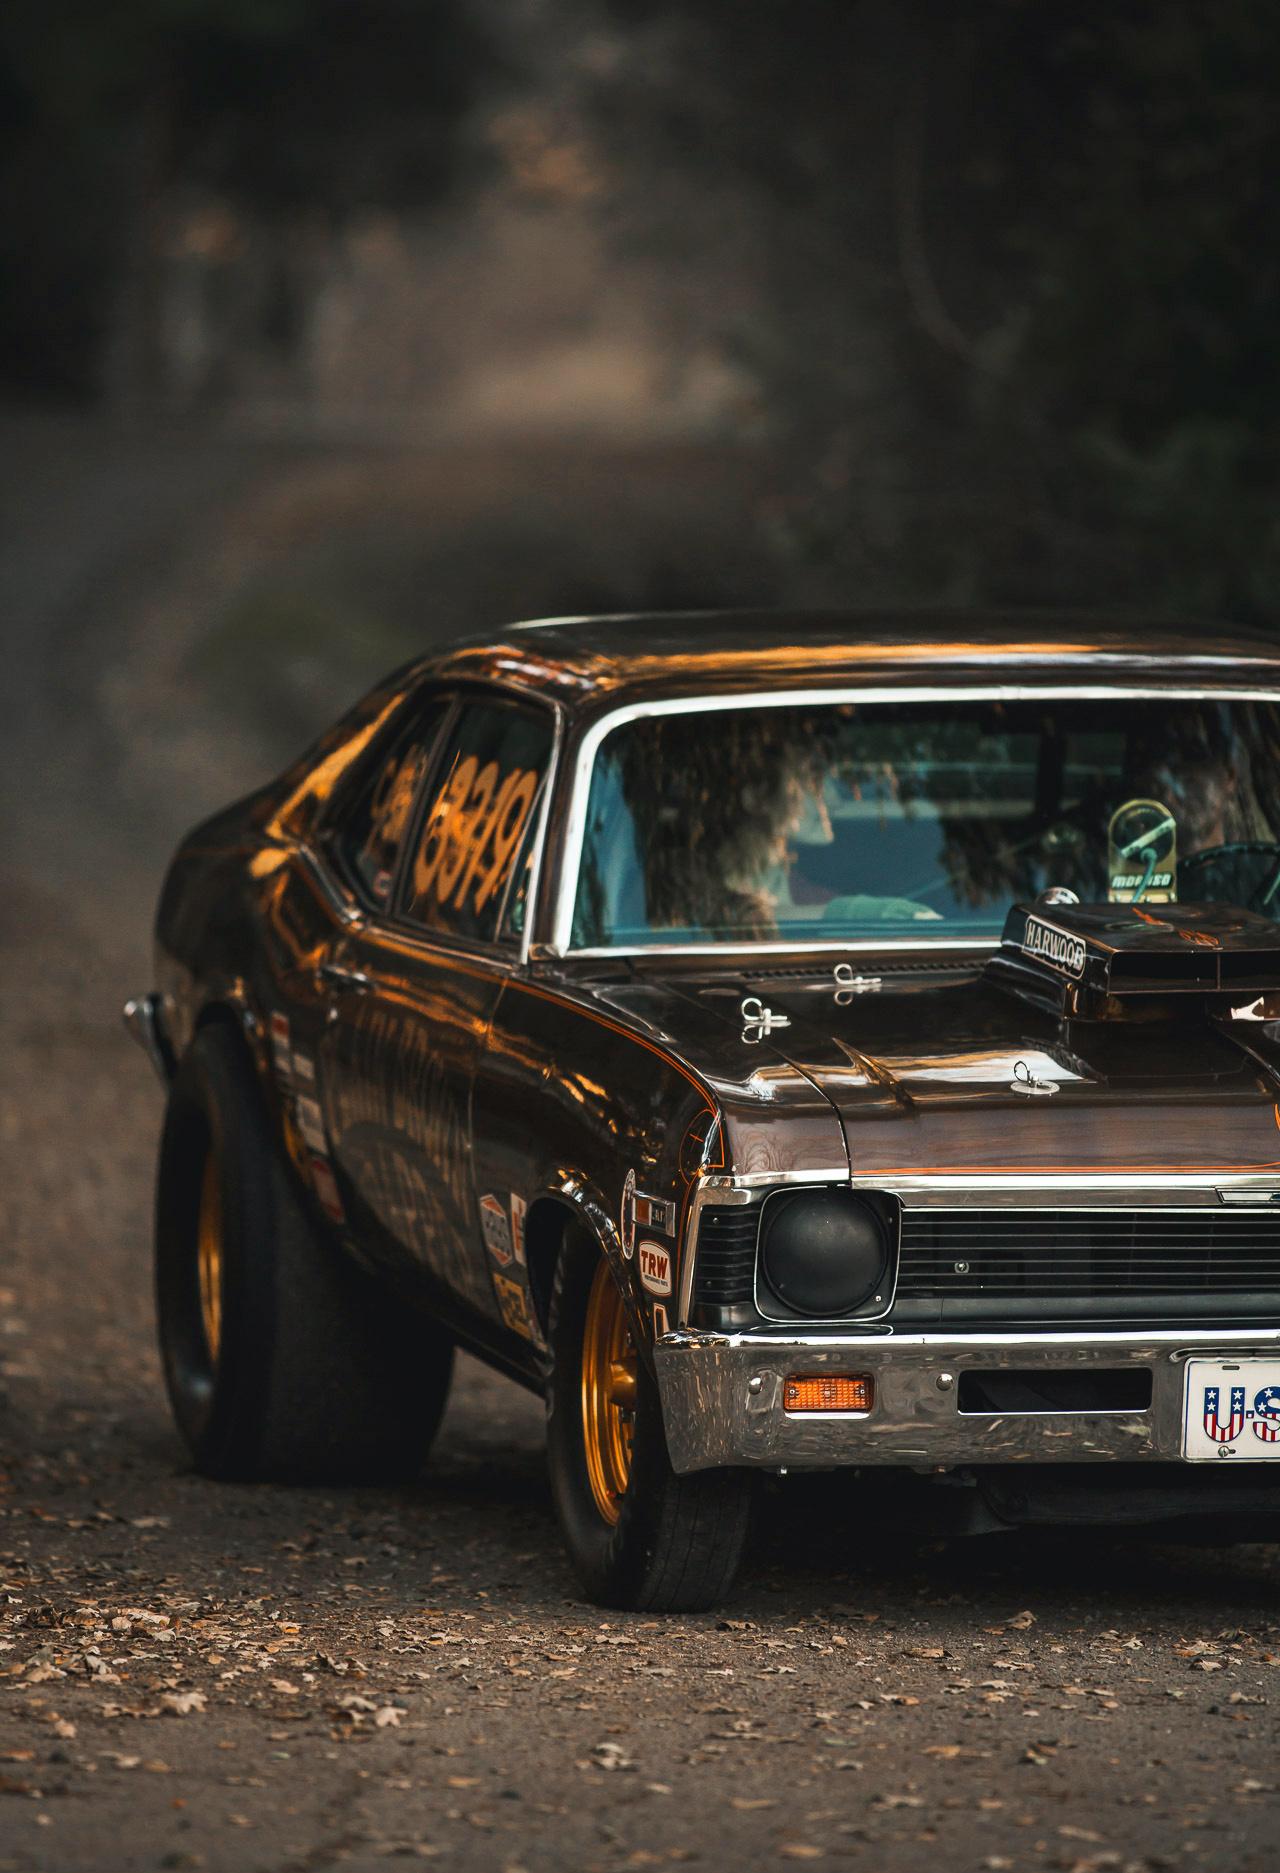 Fondos De Pantalla Speedhunters Coche Vehículo